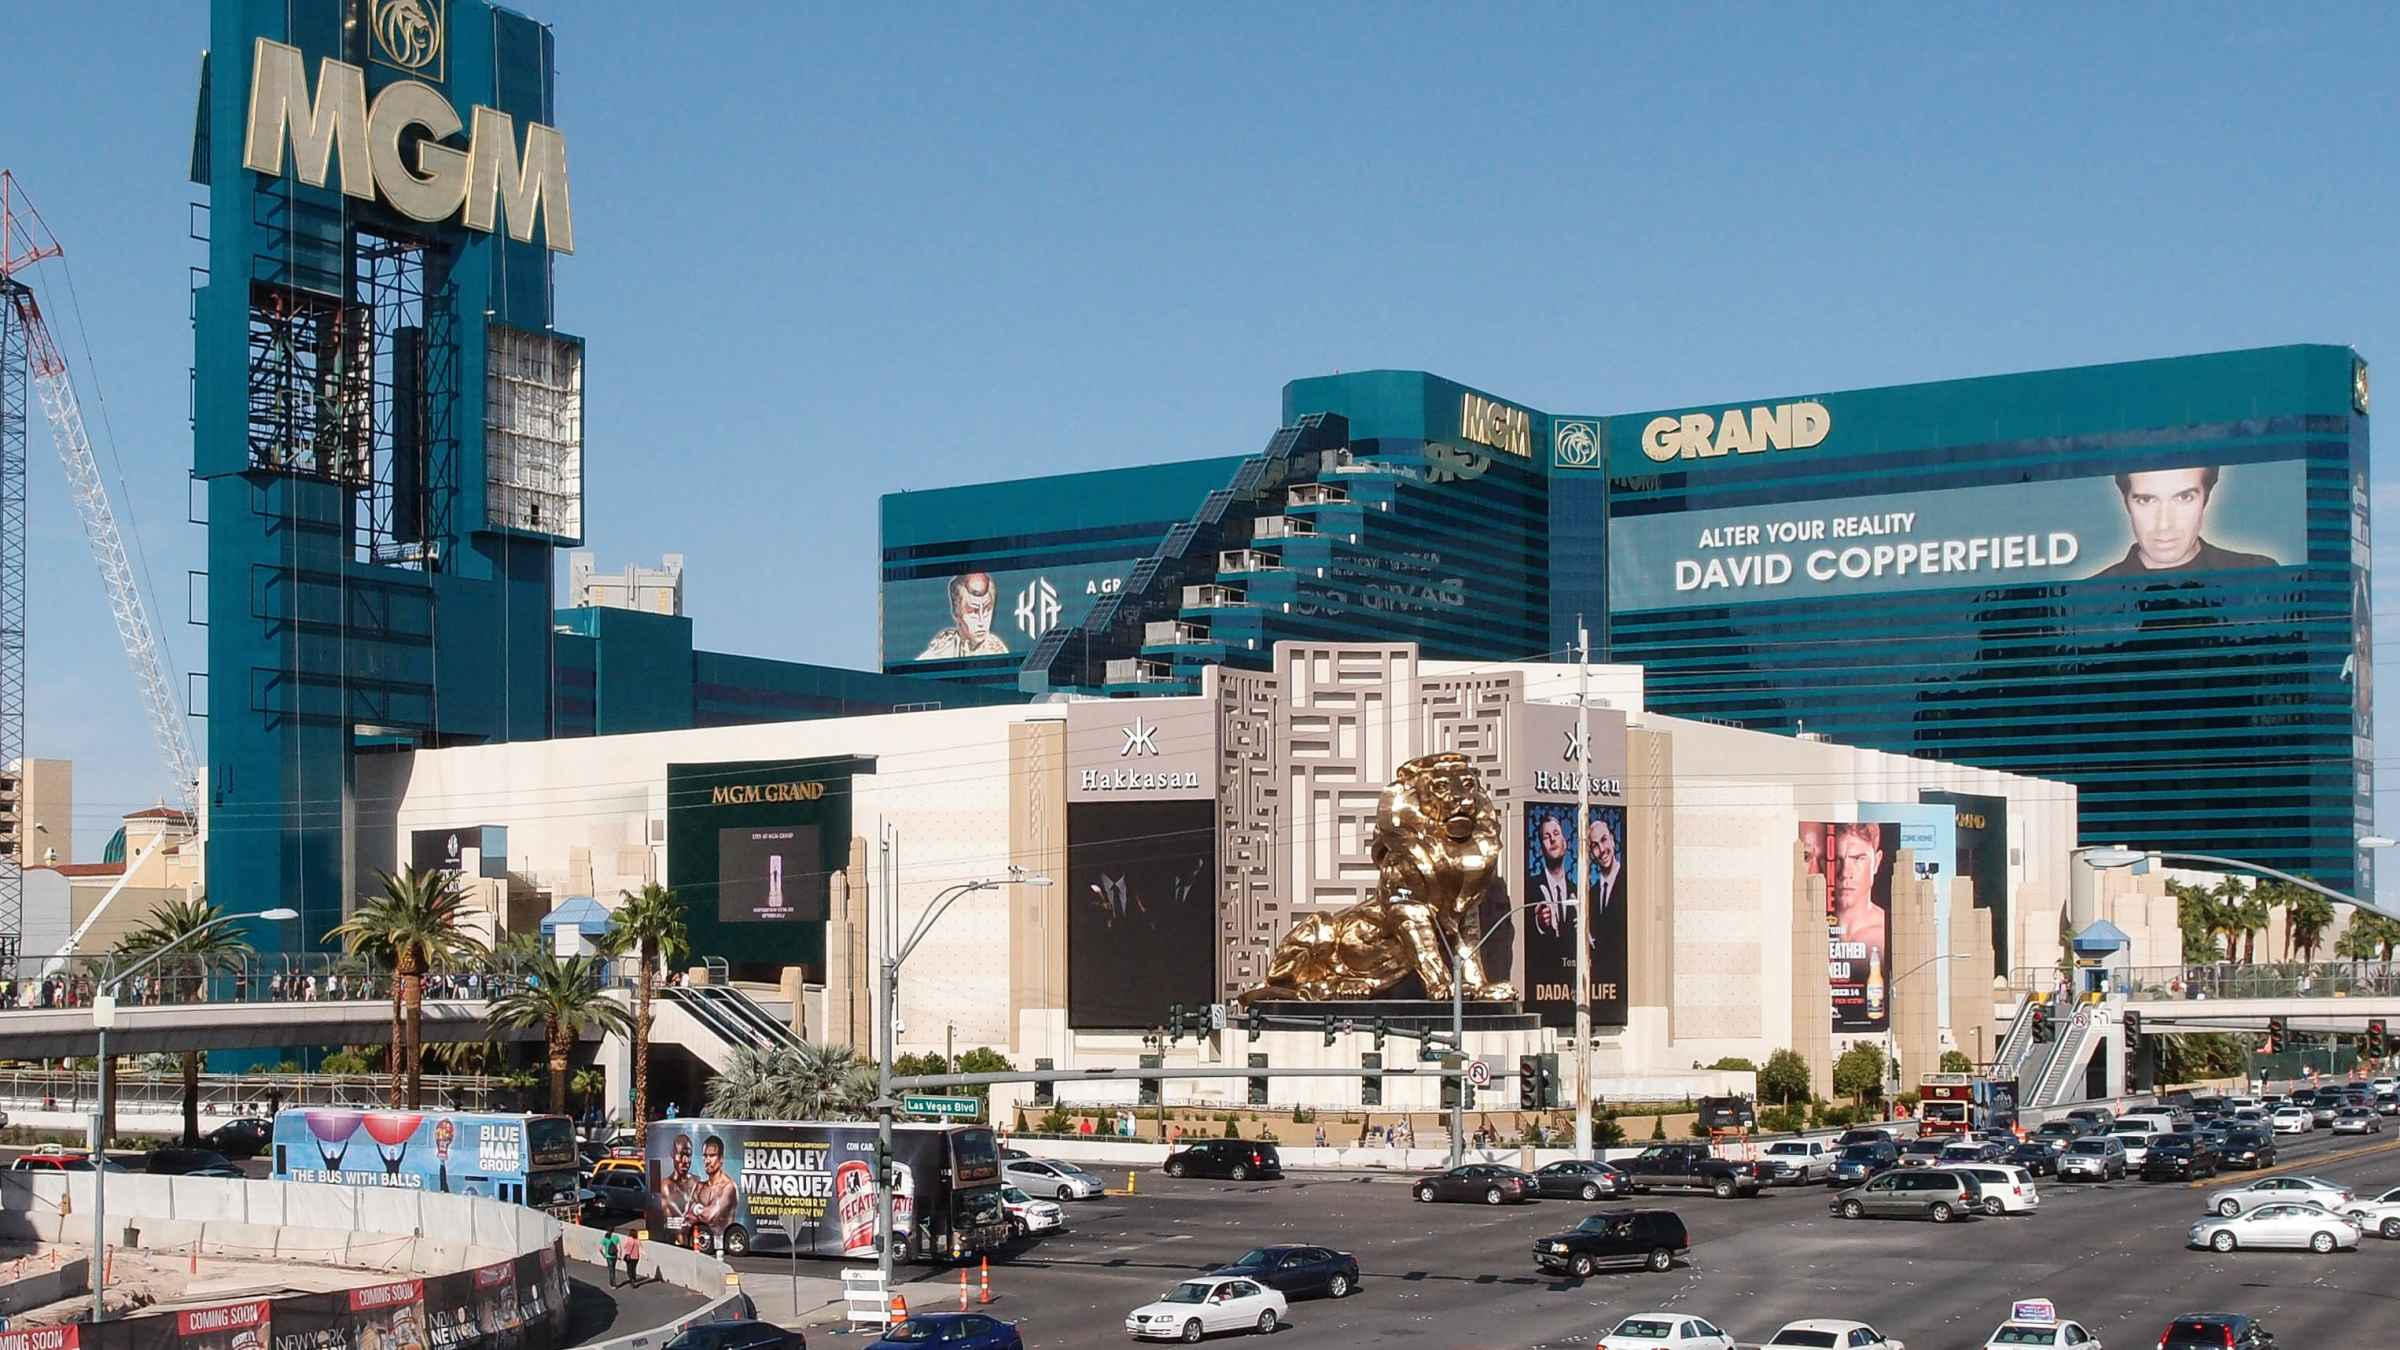 Mgm Grand Las Vegas Book Tickets Tours Getyourguide Com